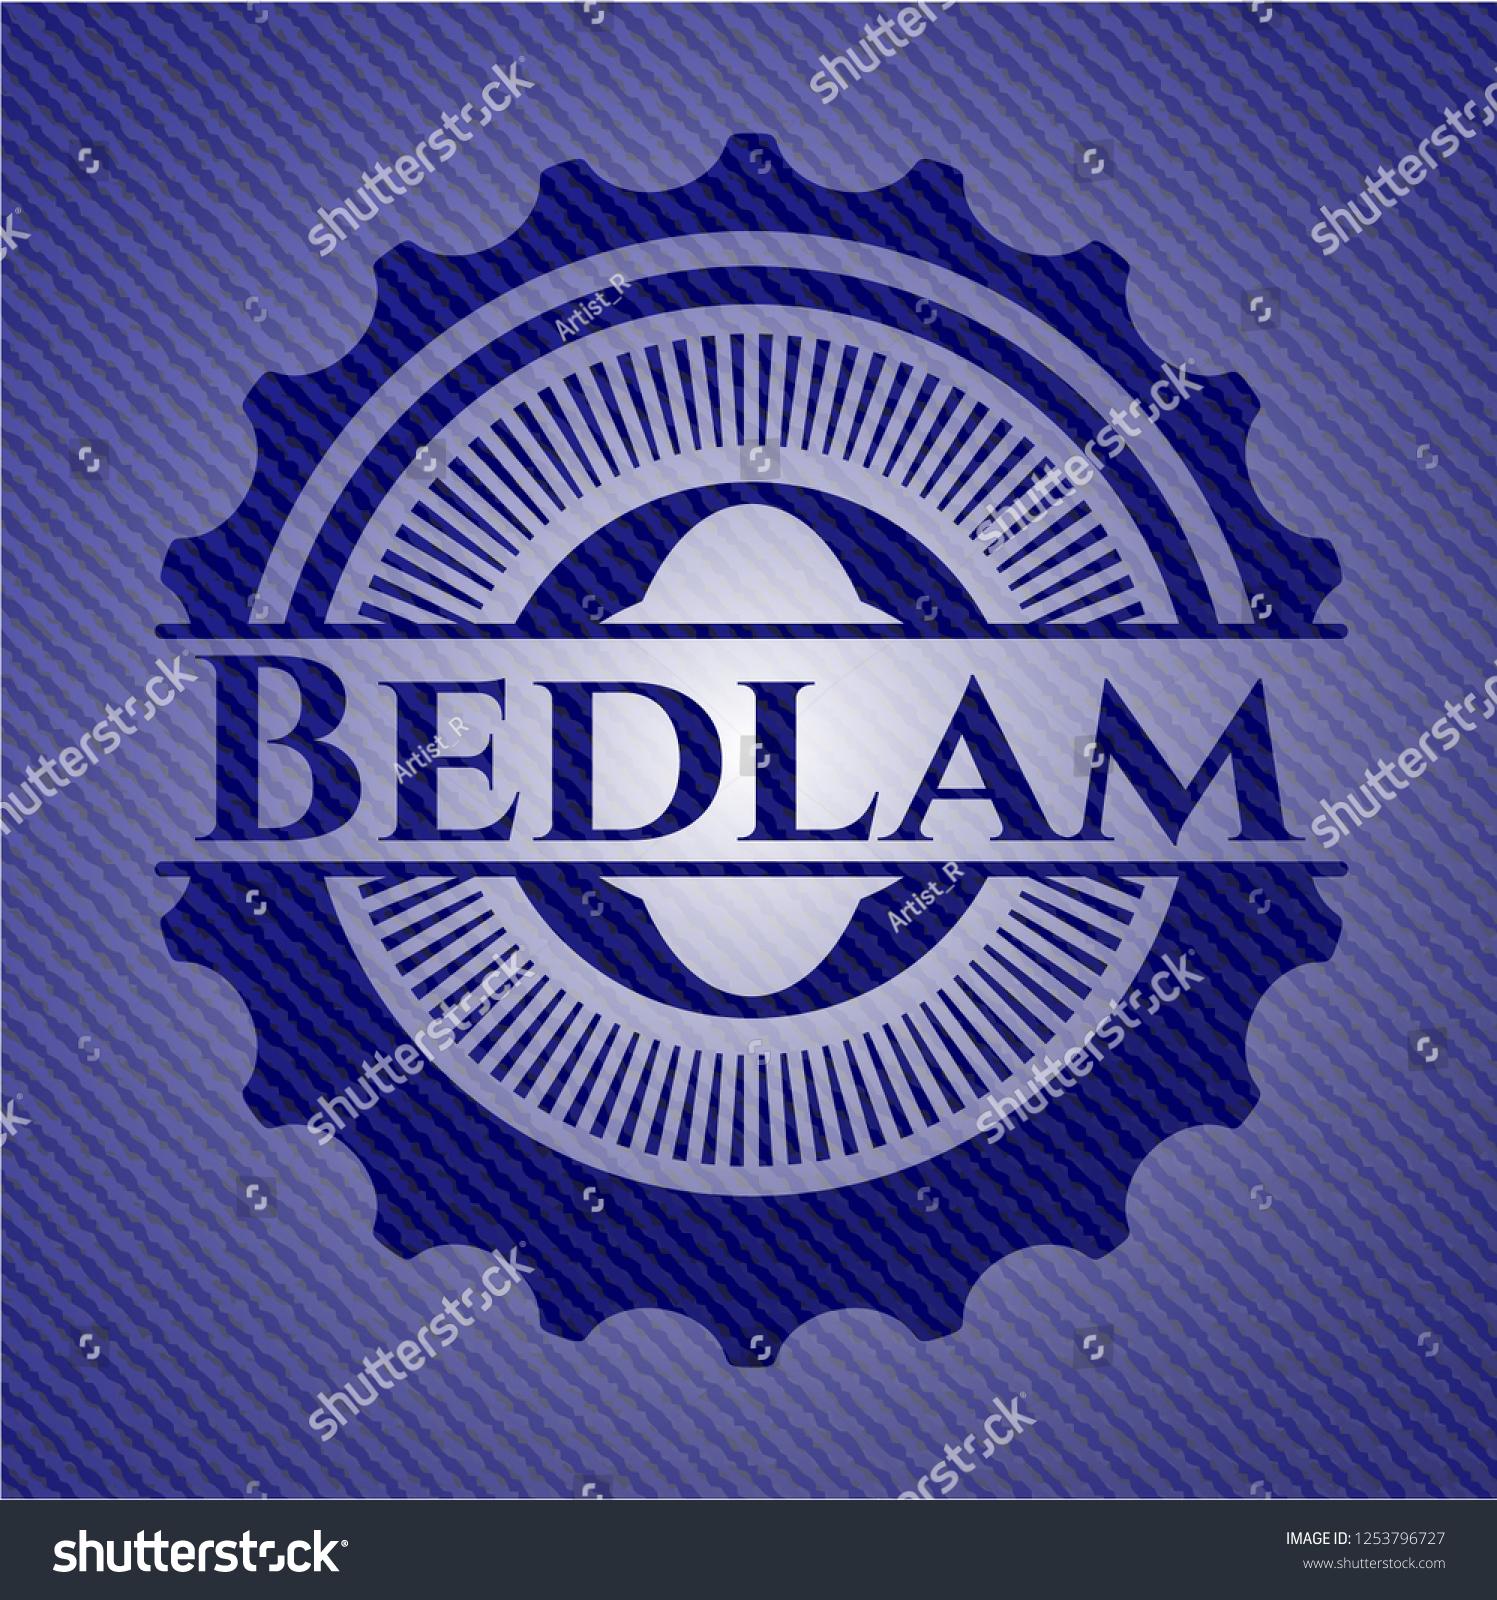 Bedlam Emblem Jean High Quality Background Stock Vector Royalty 1497x1600